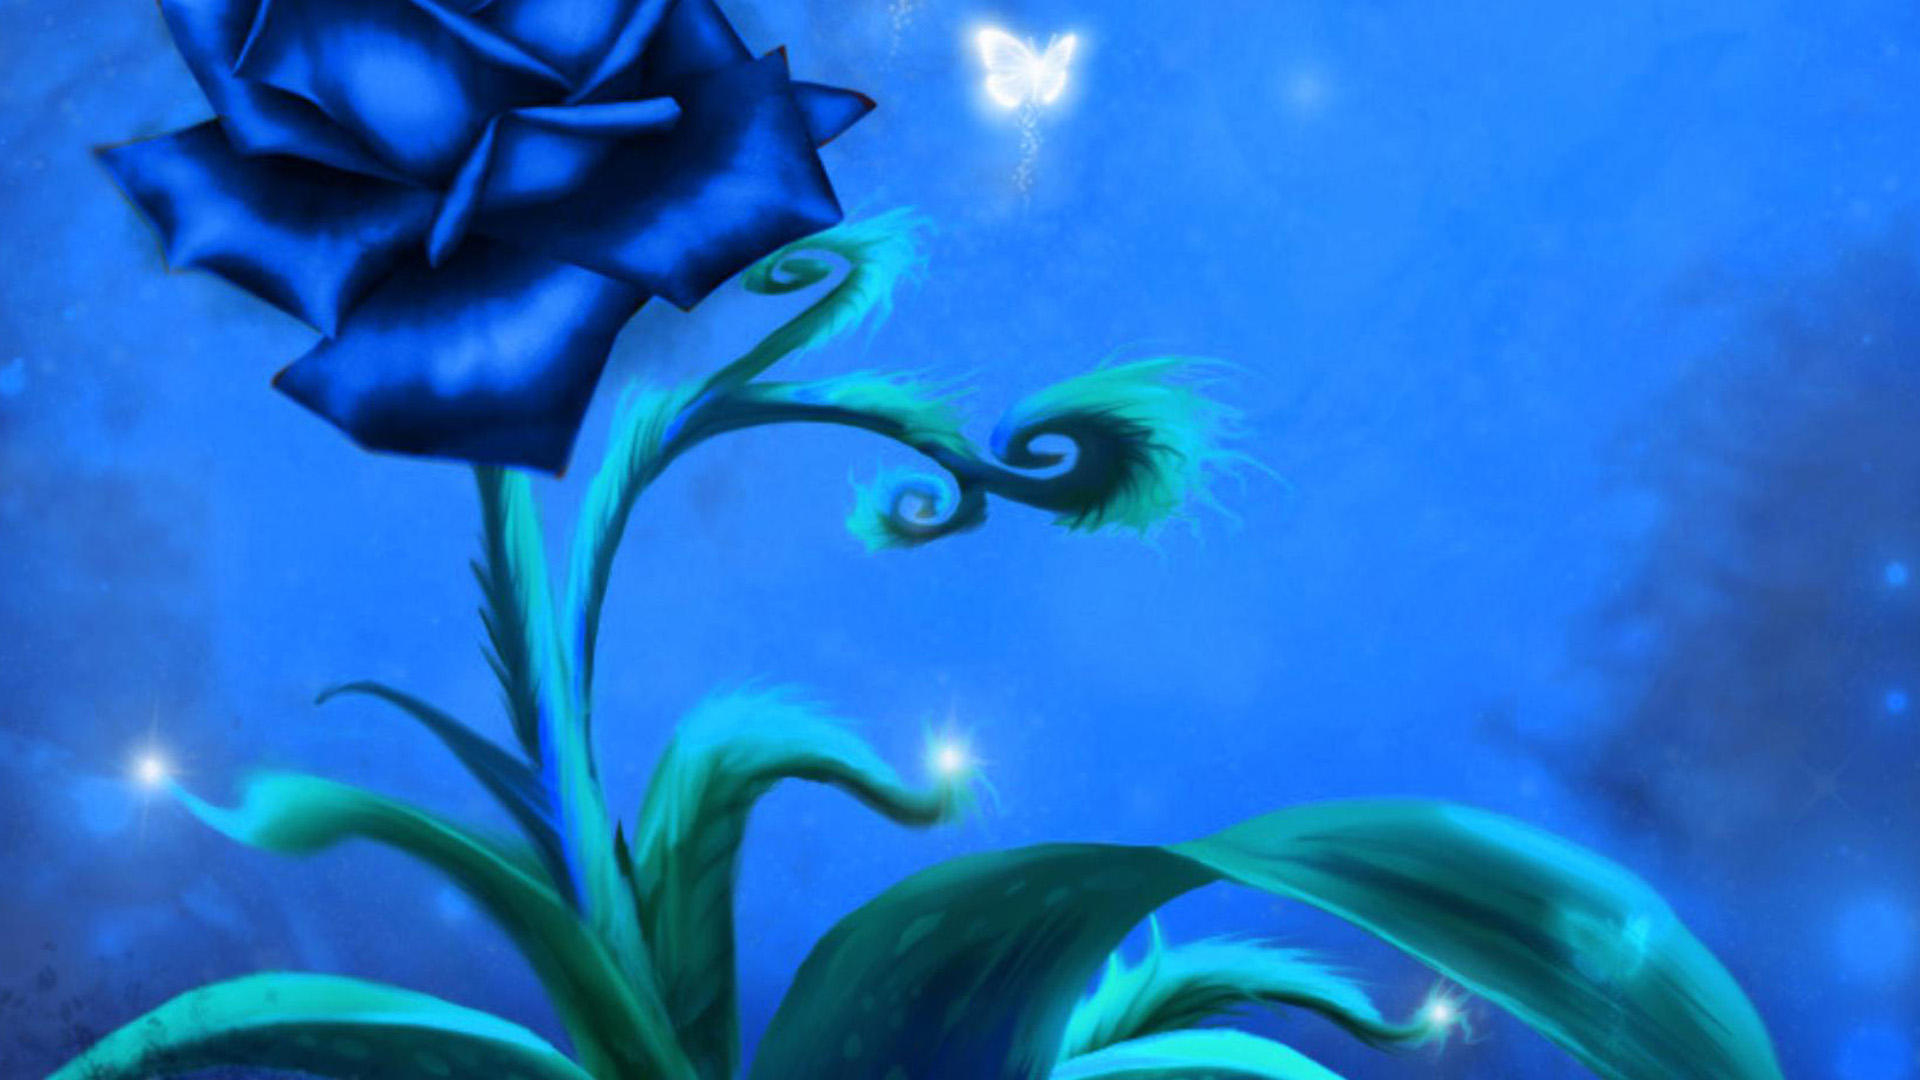 Fall Flowers Wallpaper Backgrounds 3d Hq Backgrounds Pixelstalk Net